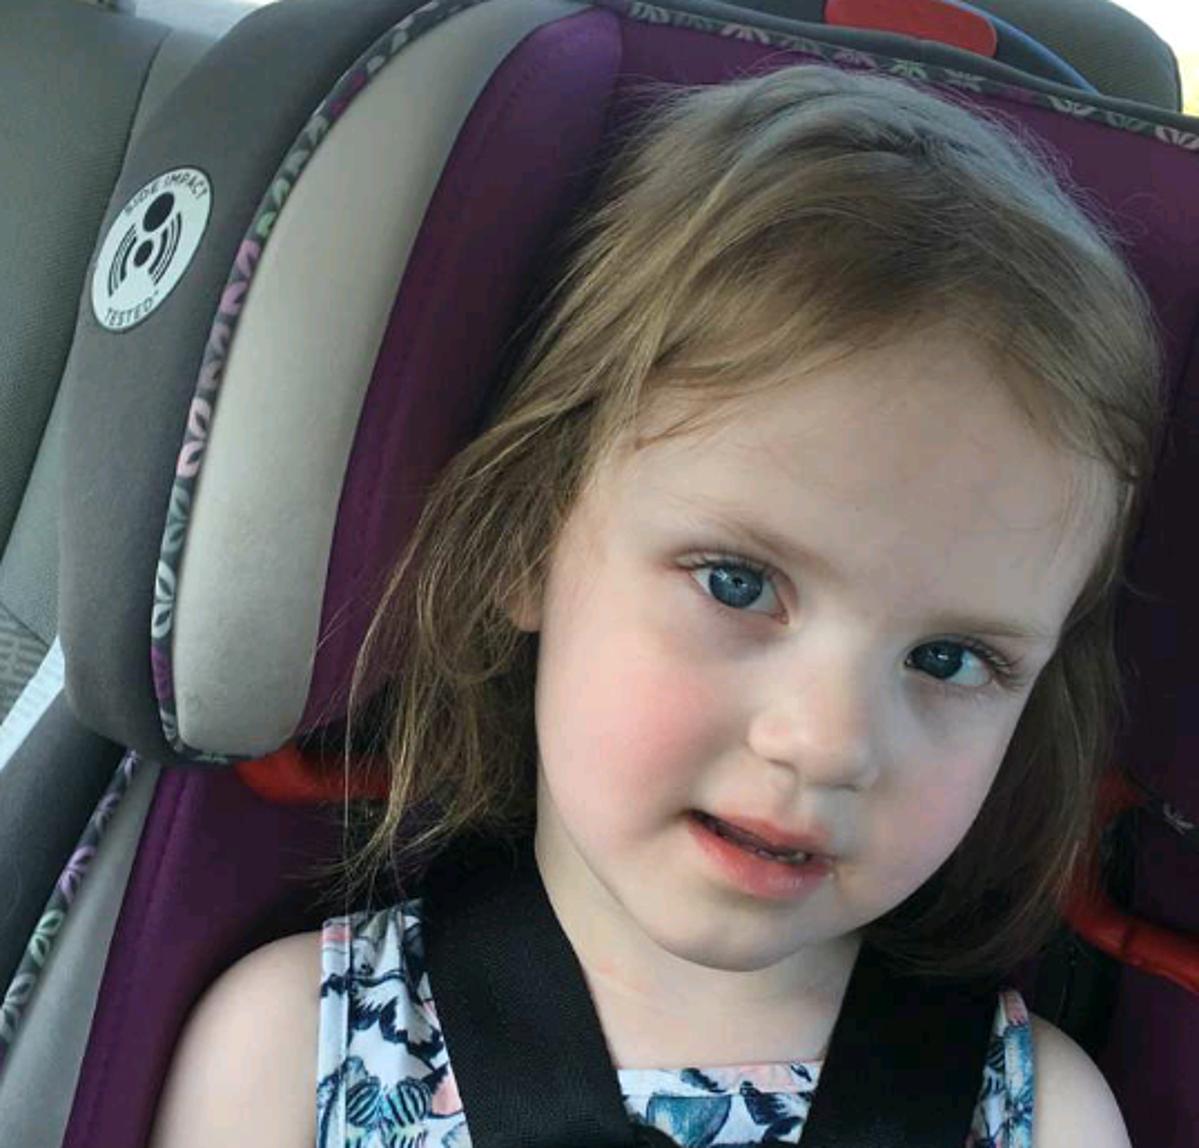 Clinton Man Seeking Help After Death of 3-Year-Old Niece